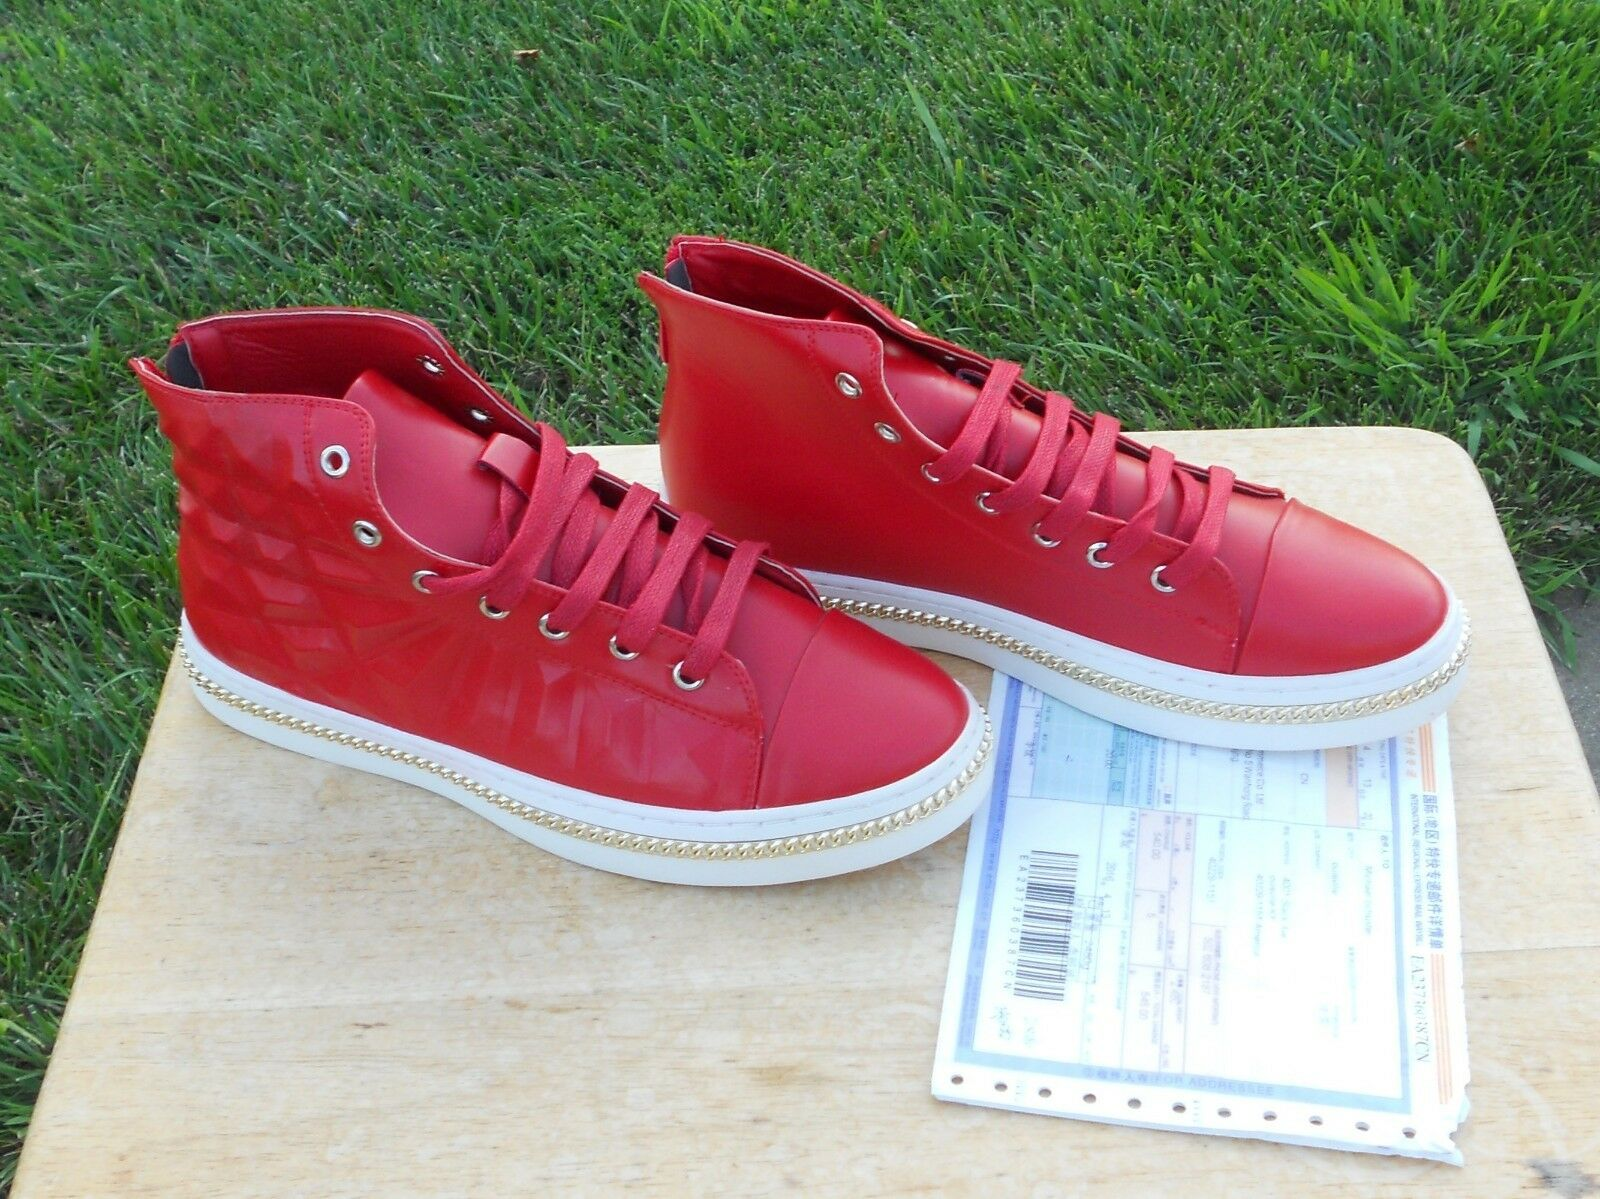 High Top Gold Chain Fashion Boots Scarpe da Ginnastica Boots Fashion Shoes High Tops Rosso  540 China Import f00786